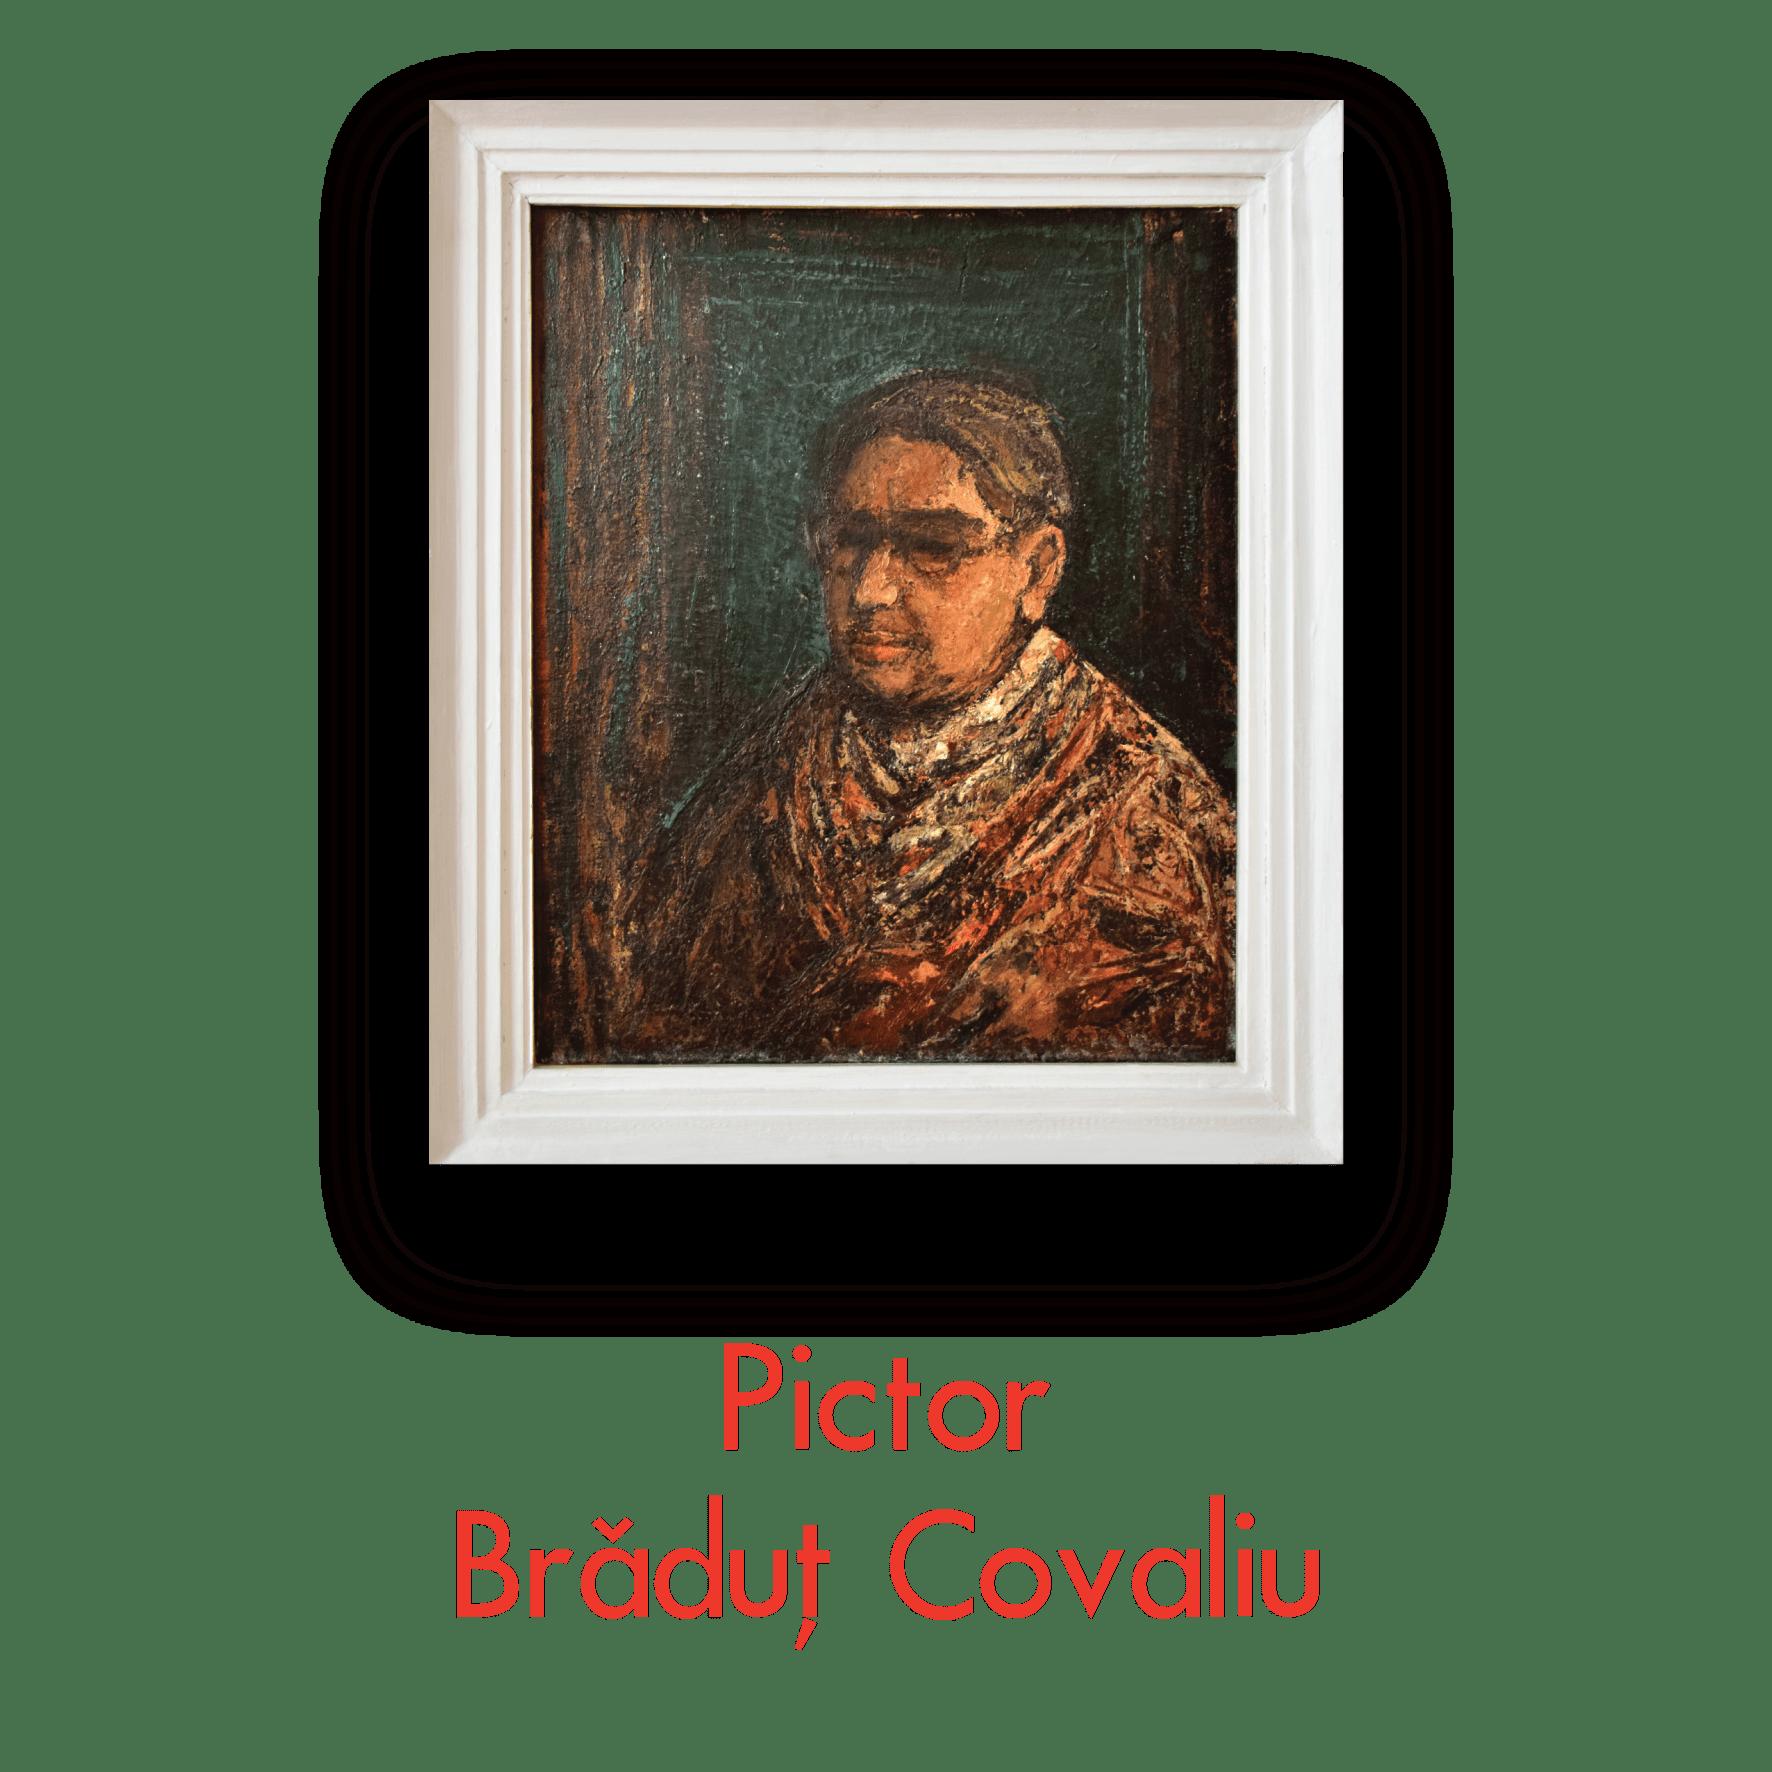 Pictor Bradut Covaliunet-min